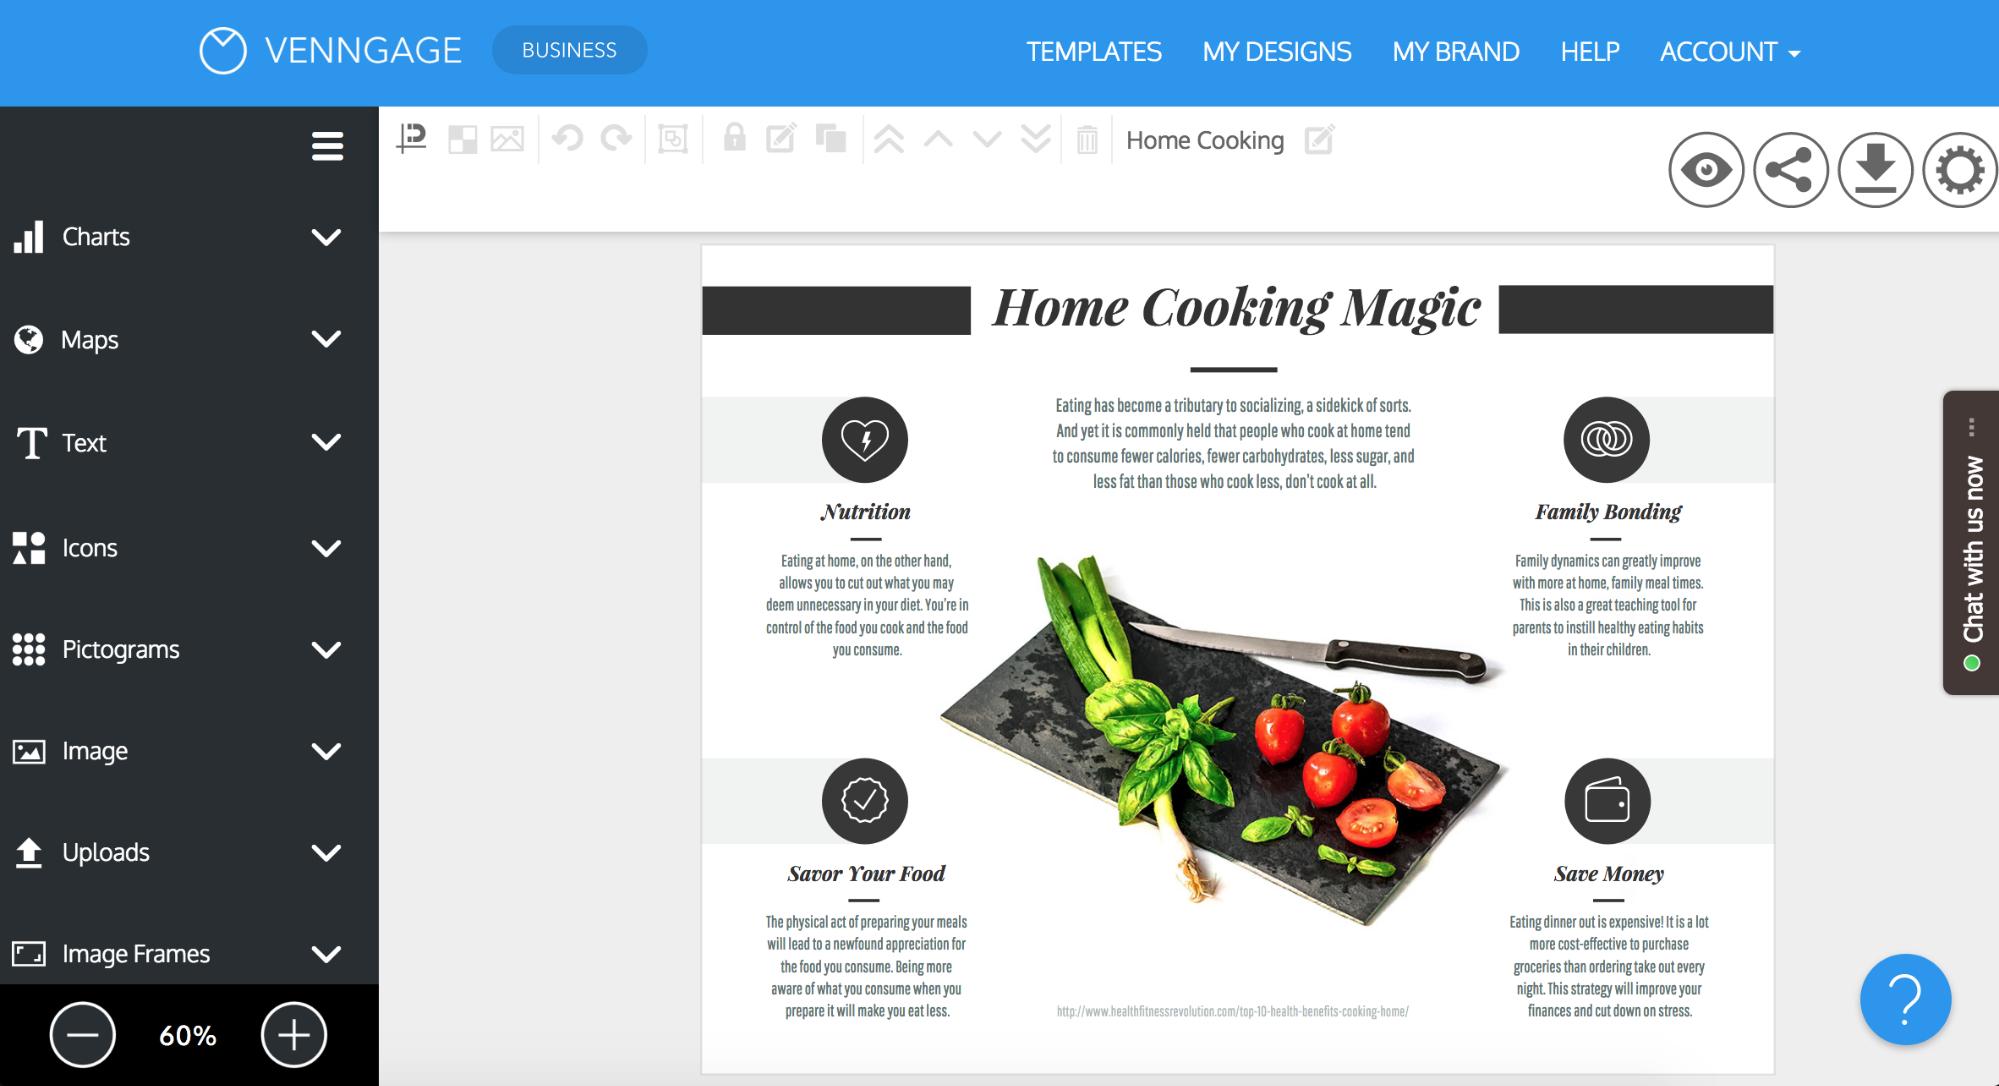 Online Brochure Maker - Make Your Own Brochure With Venngage - Free Printable Brochure Maker Download